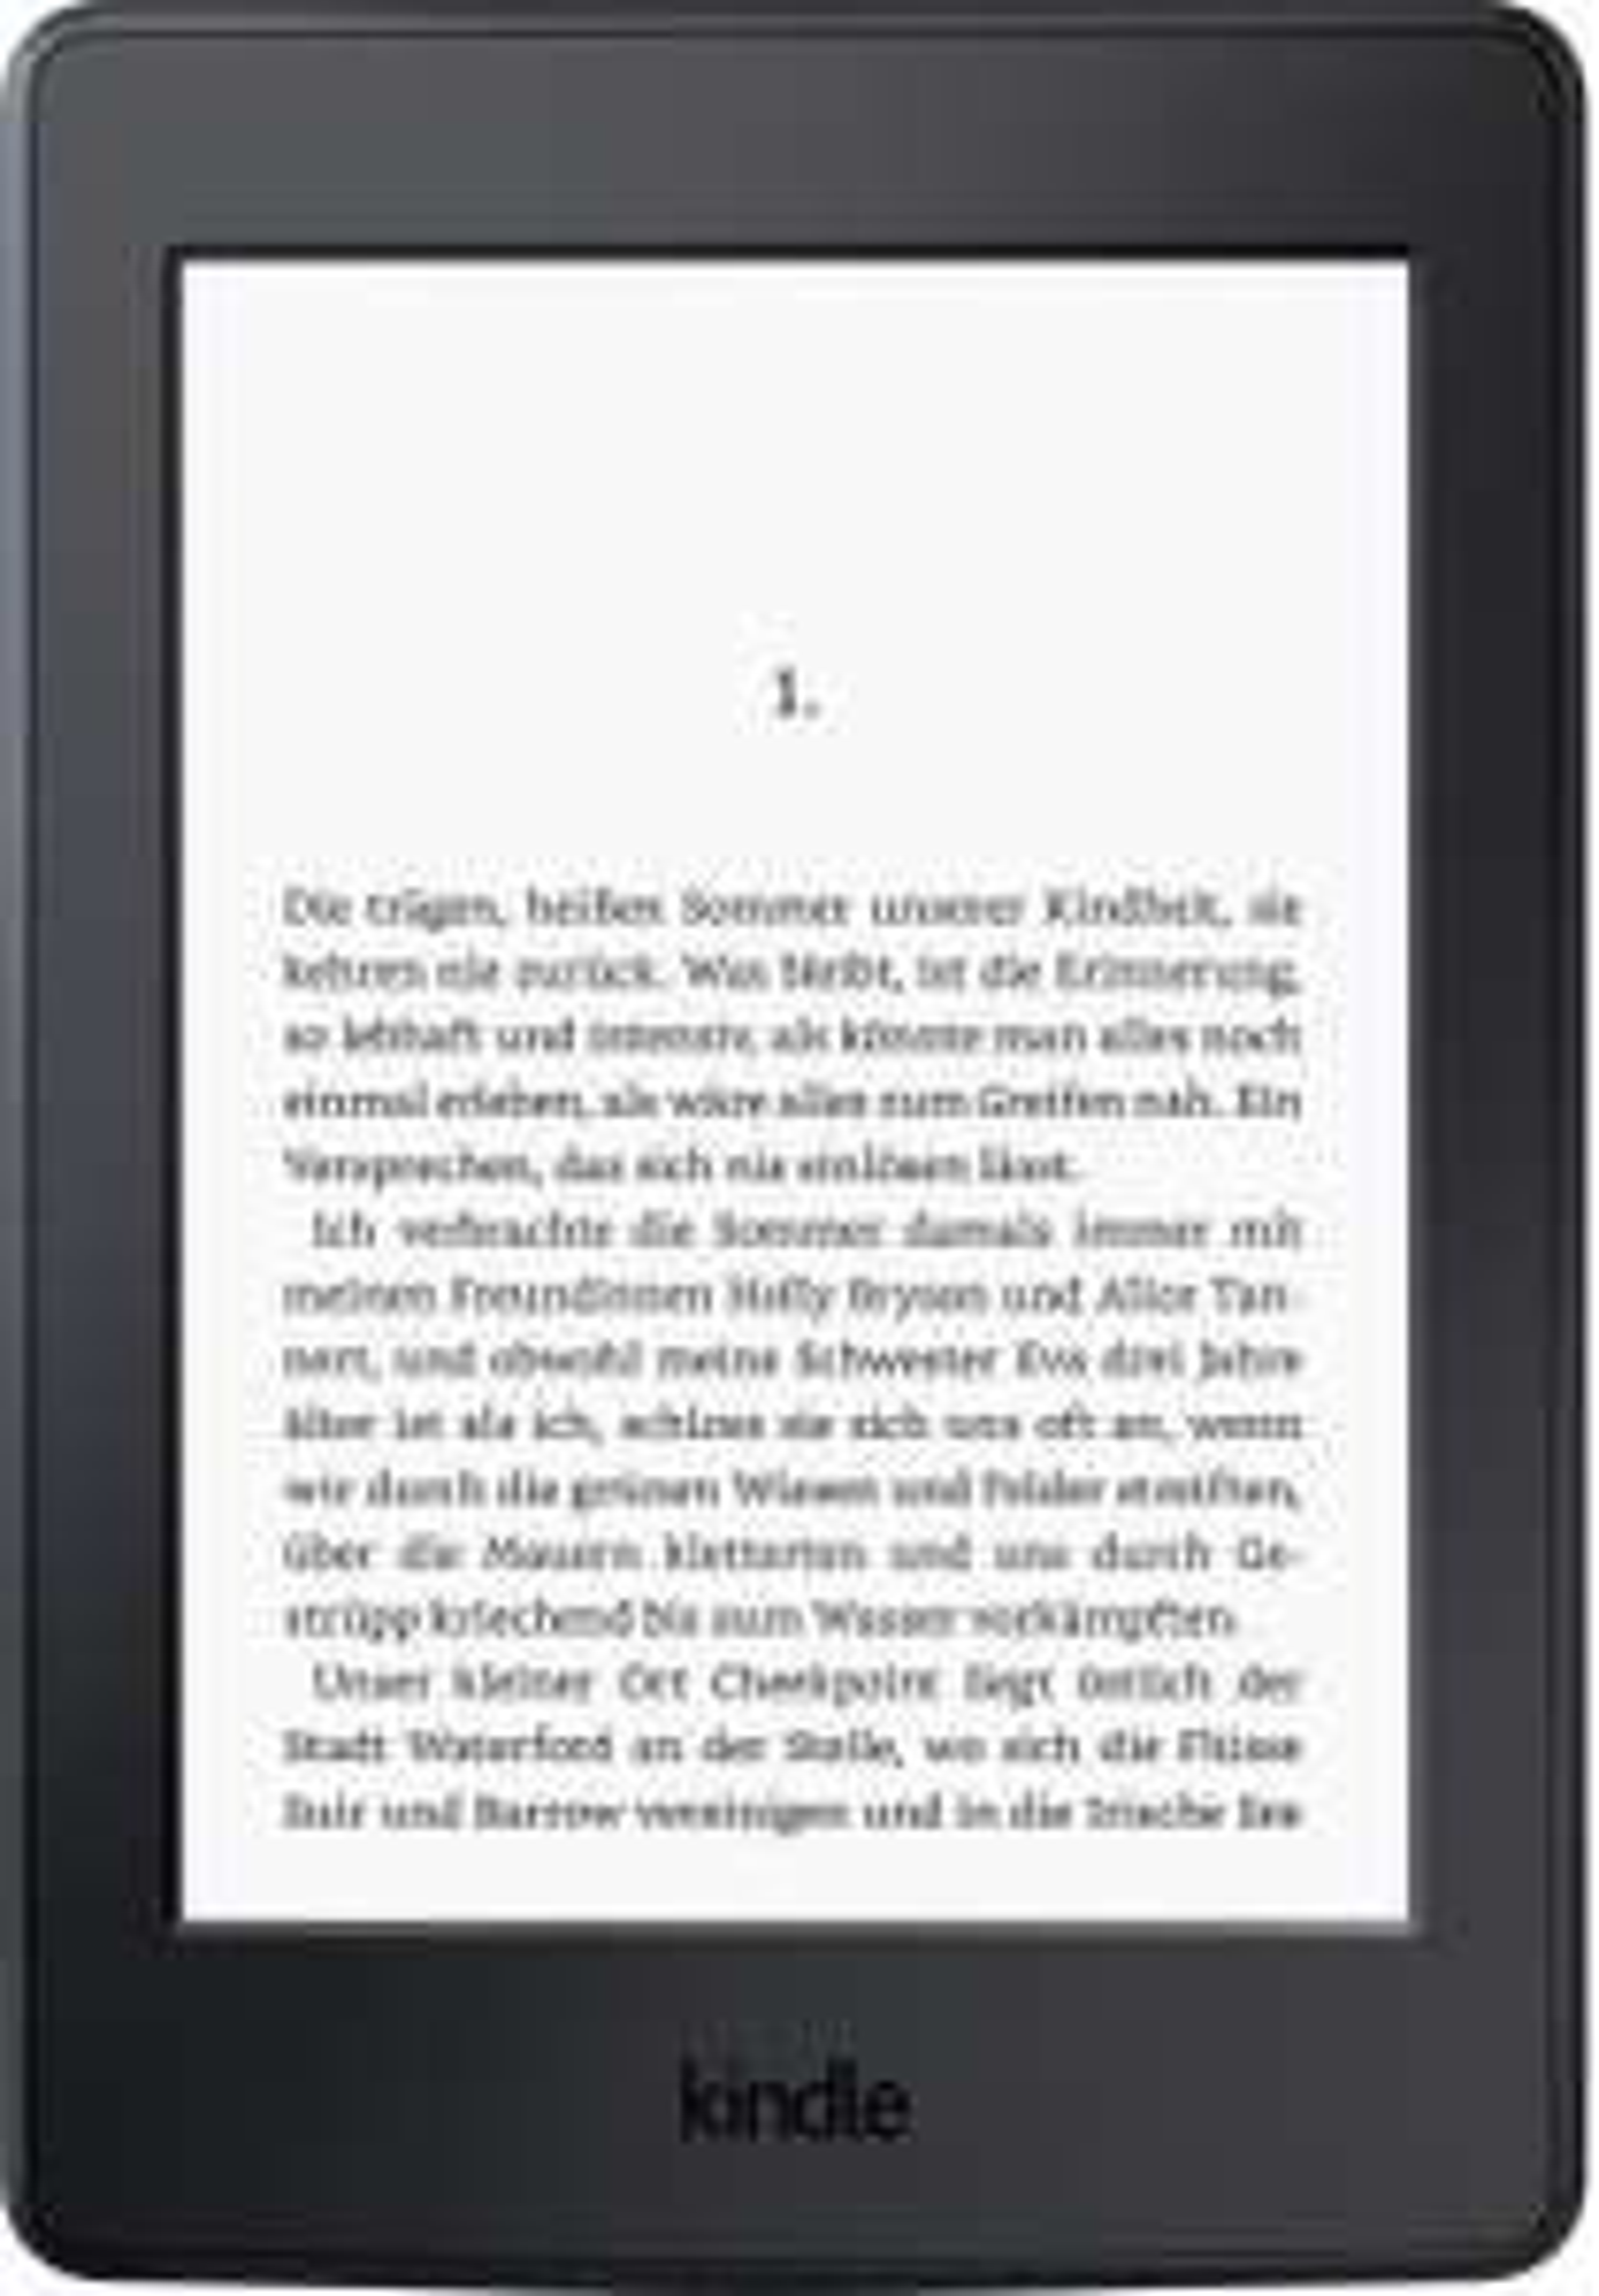 Kindle Paperwhite für 59,99€ bei Quelle